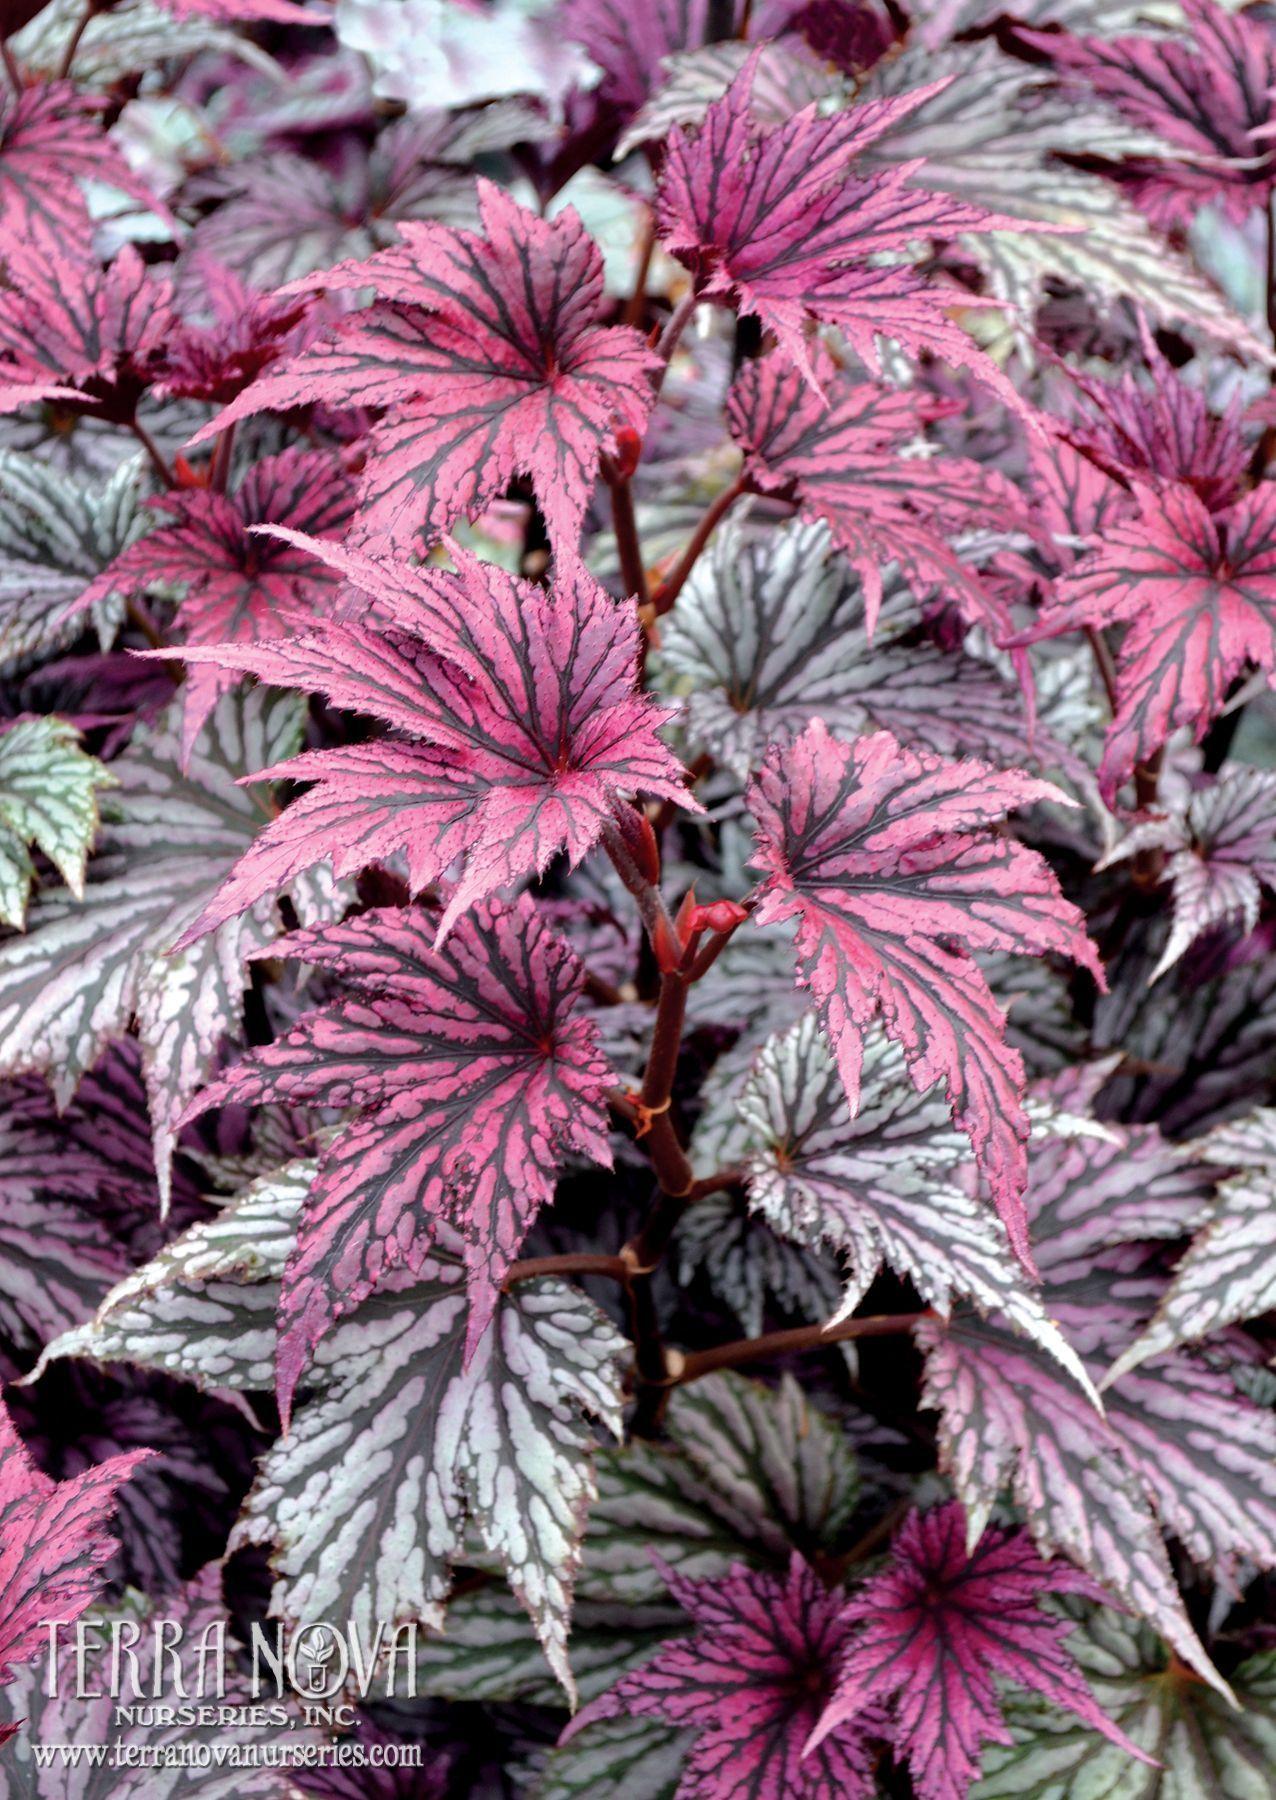 Begonia Garden Angel Blush Pewter Silver Palmate Leaves Resemble Those Of A Japanese Maple Add To That Coal Black Veins Tanaman Dalam Rumah Bunga Tanaman